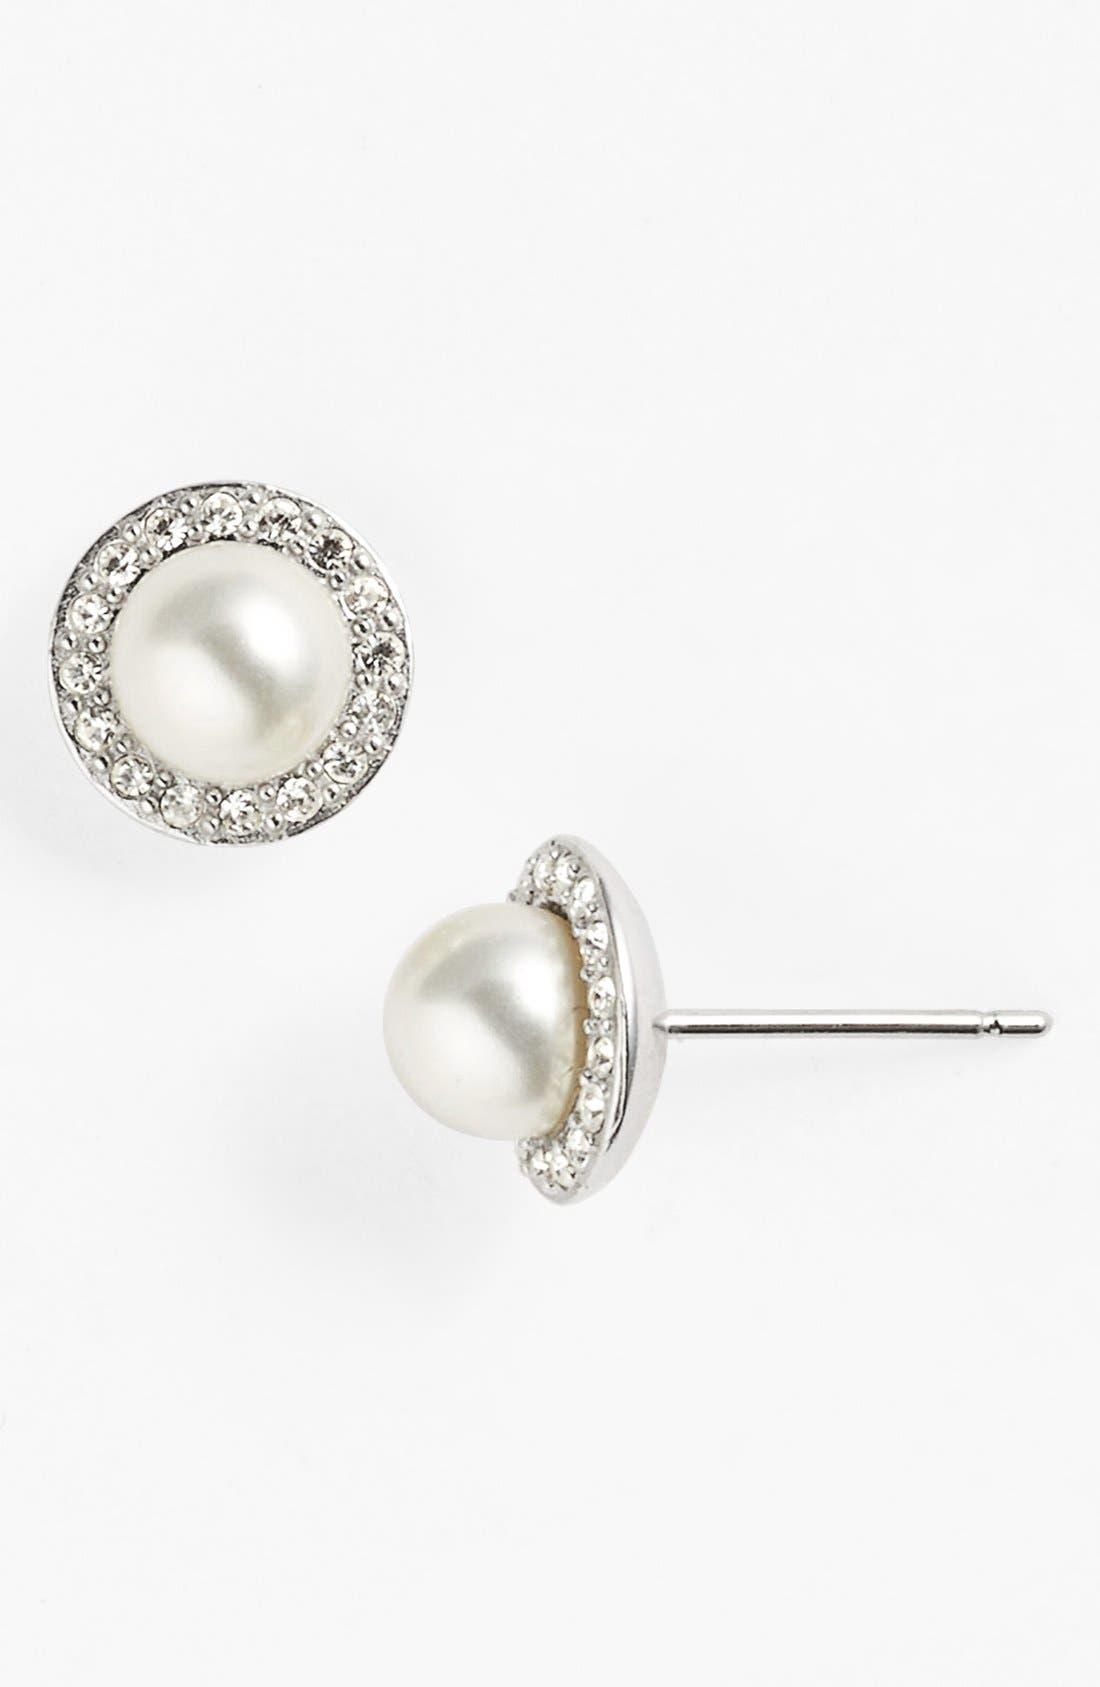 Main Image - Judith Jack 'Pearl Romance' Faux Pearl Stud Earrings